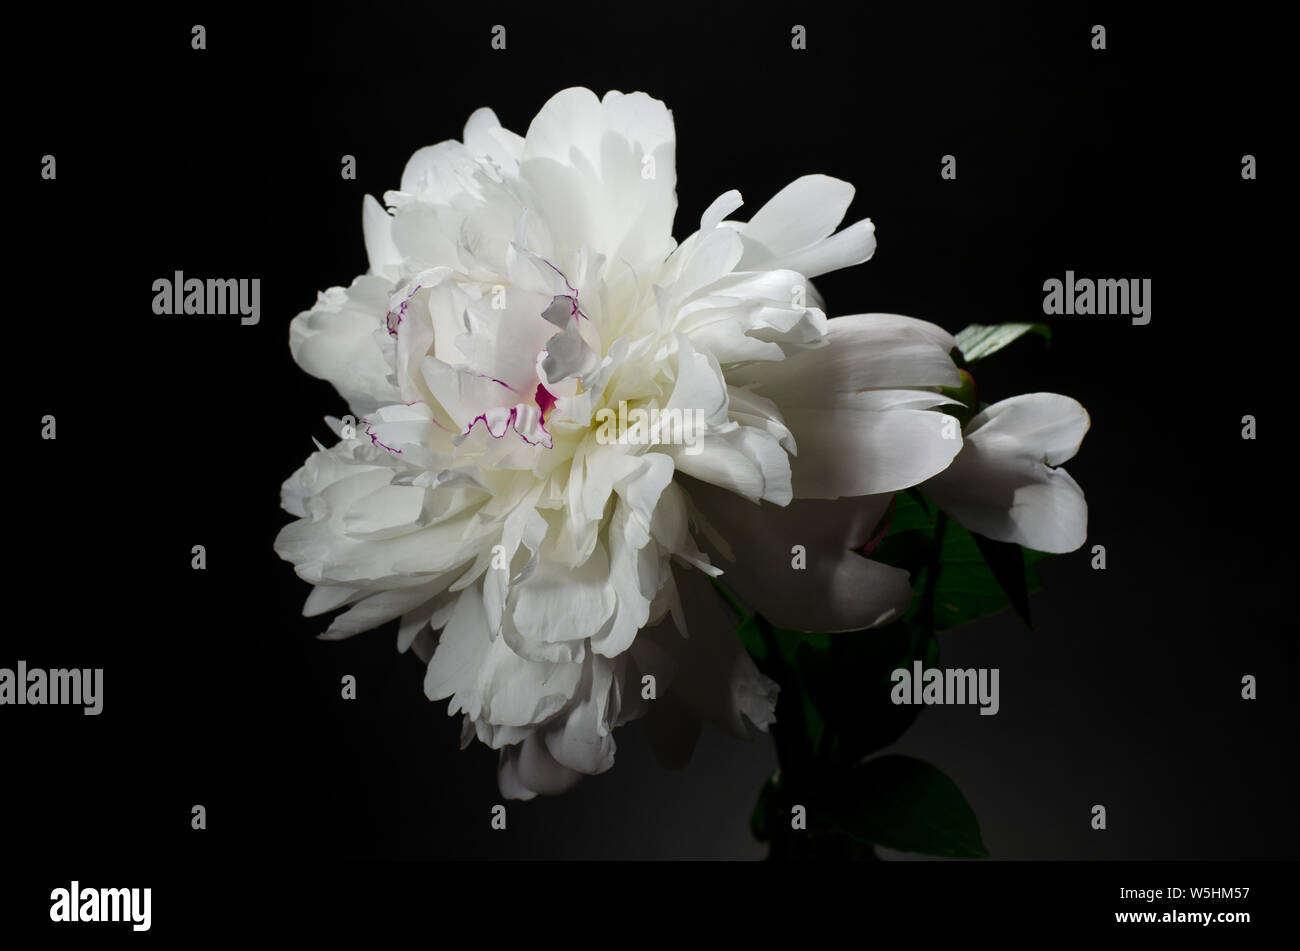 Big Bright Peony Against Black Backdrop Dark Moody Floral